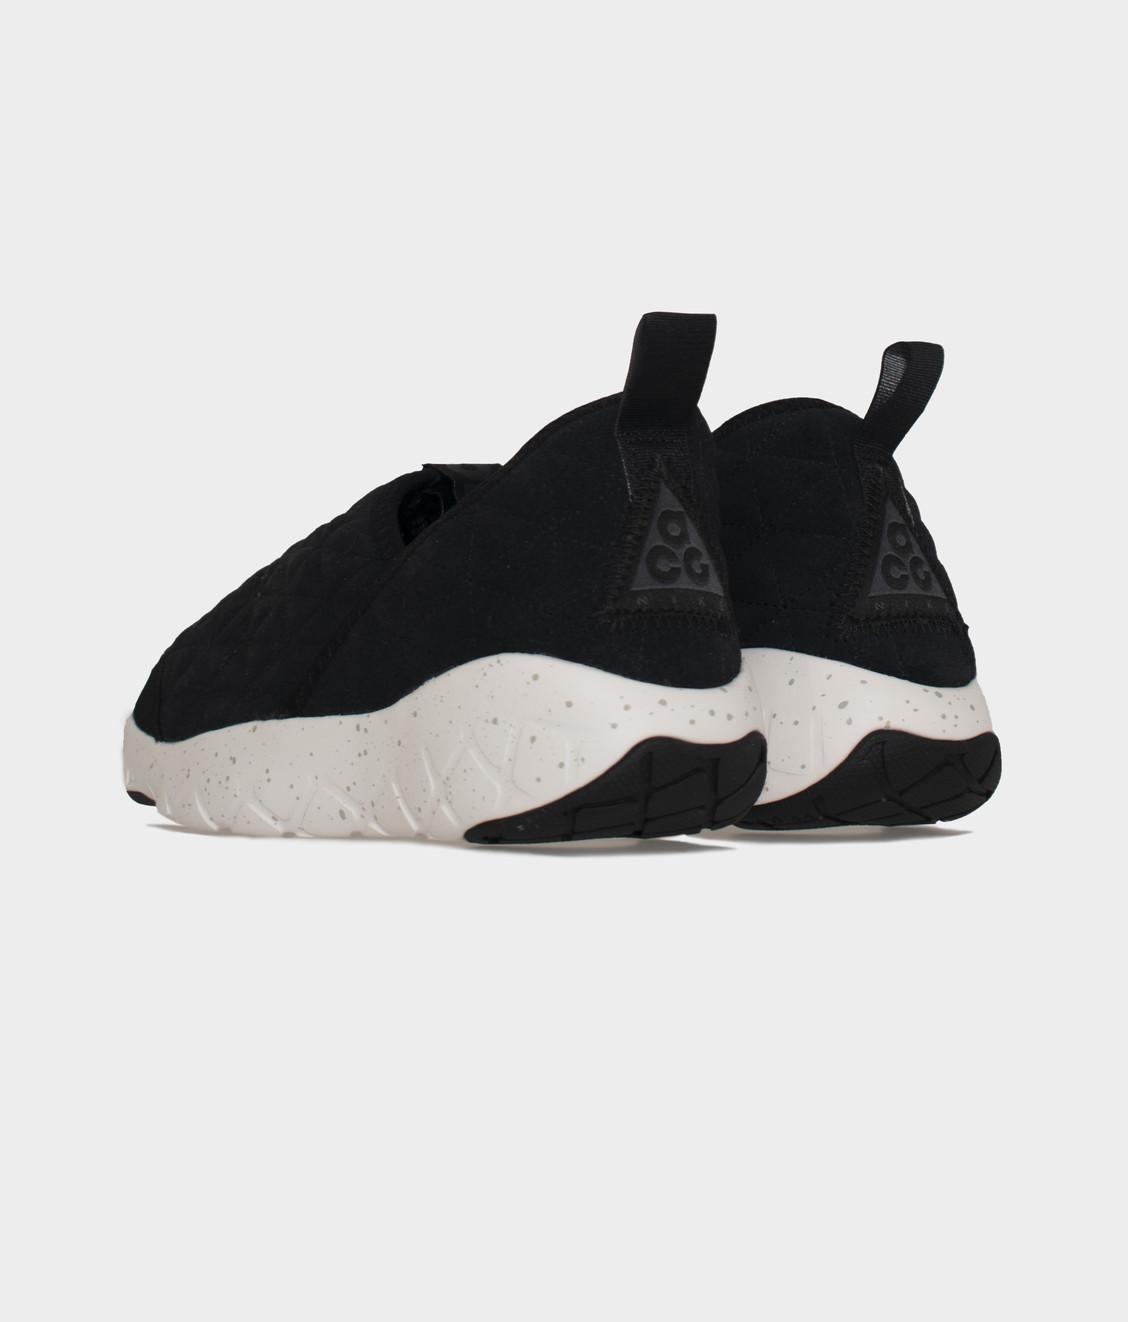 Nike ACG Moc 3.0 Black Anthracite